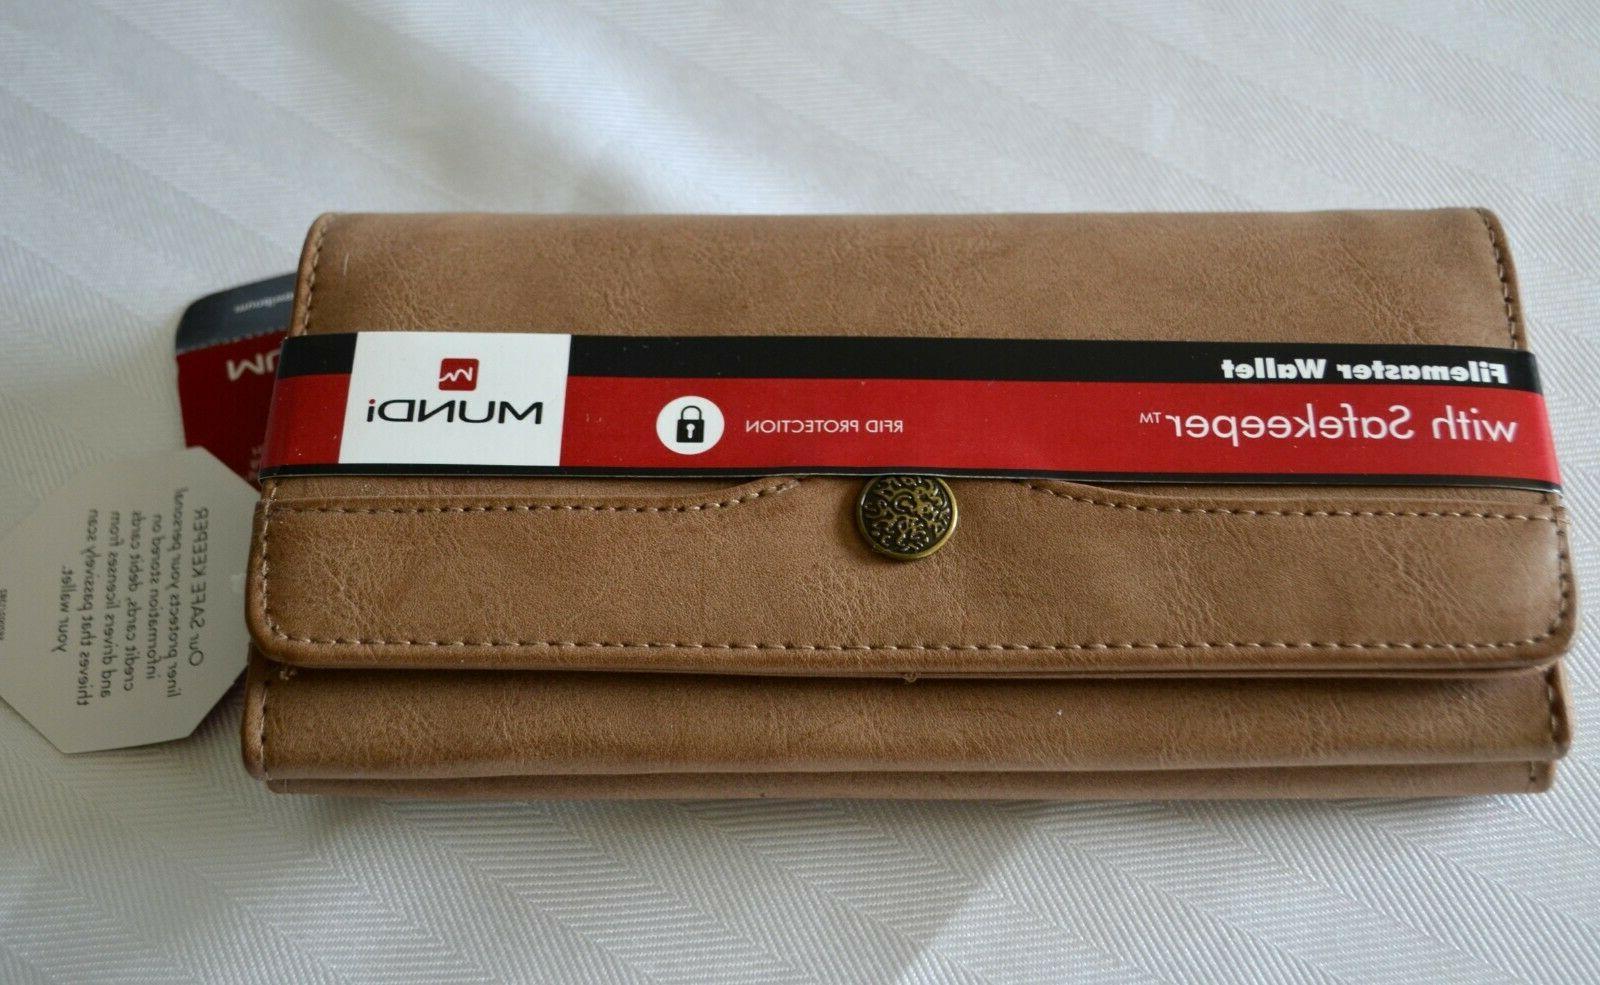 file master safekeeper wallet clutch brown rfid